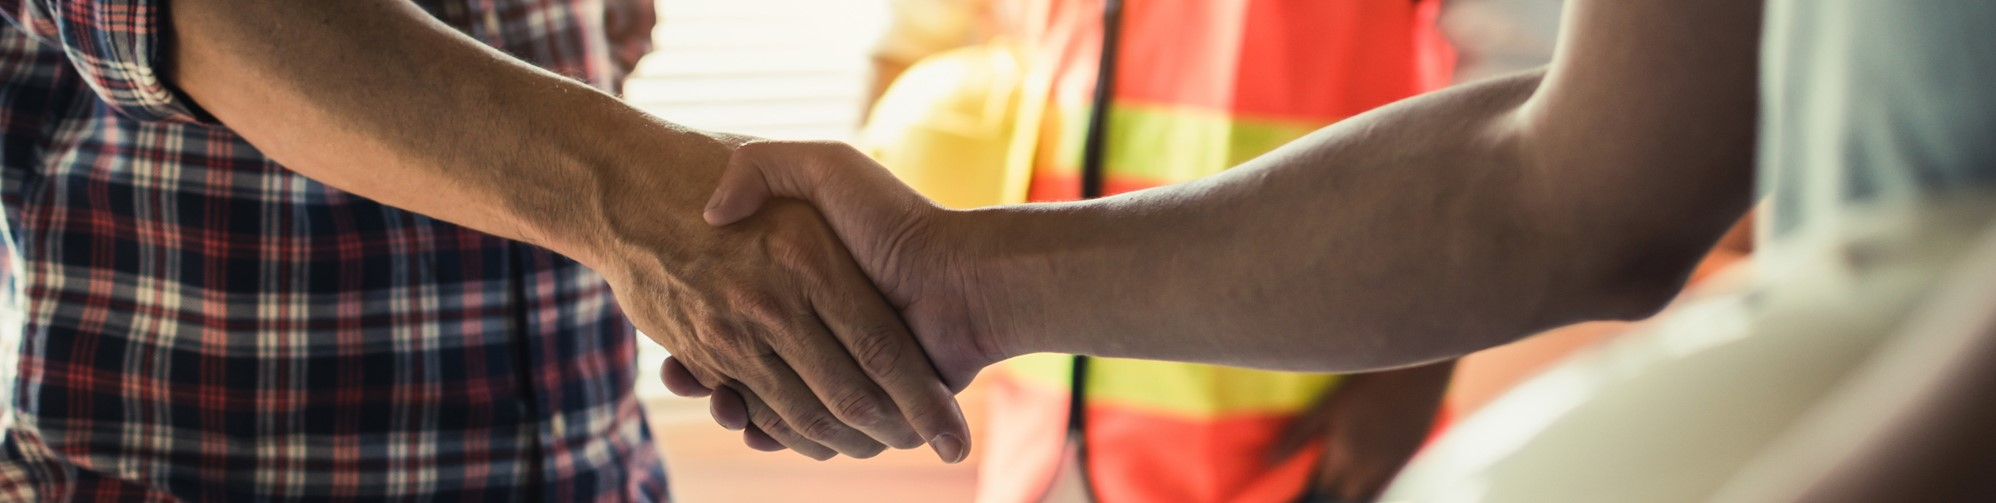 formation salarié  désigné compétent agréée CRAMIF/CARSAT